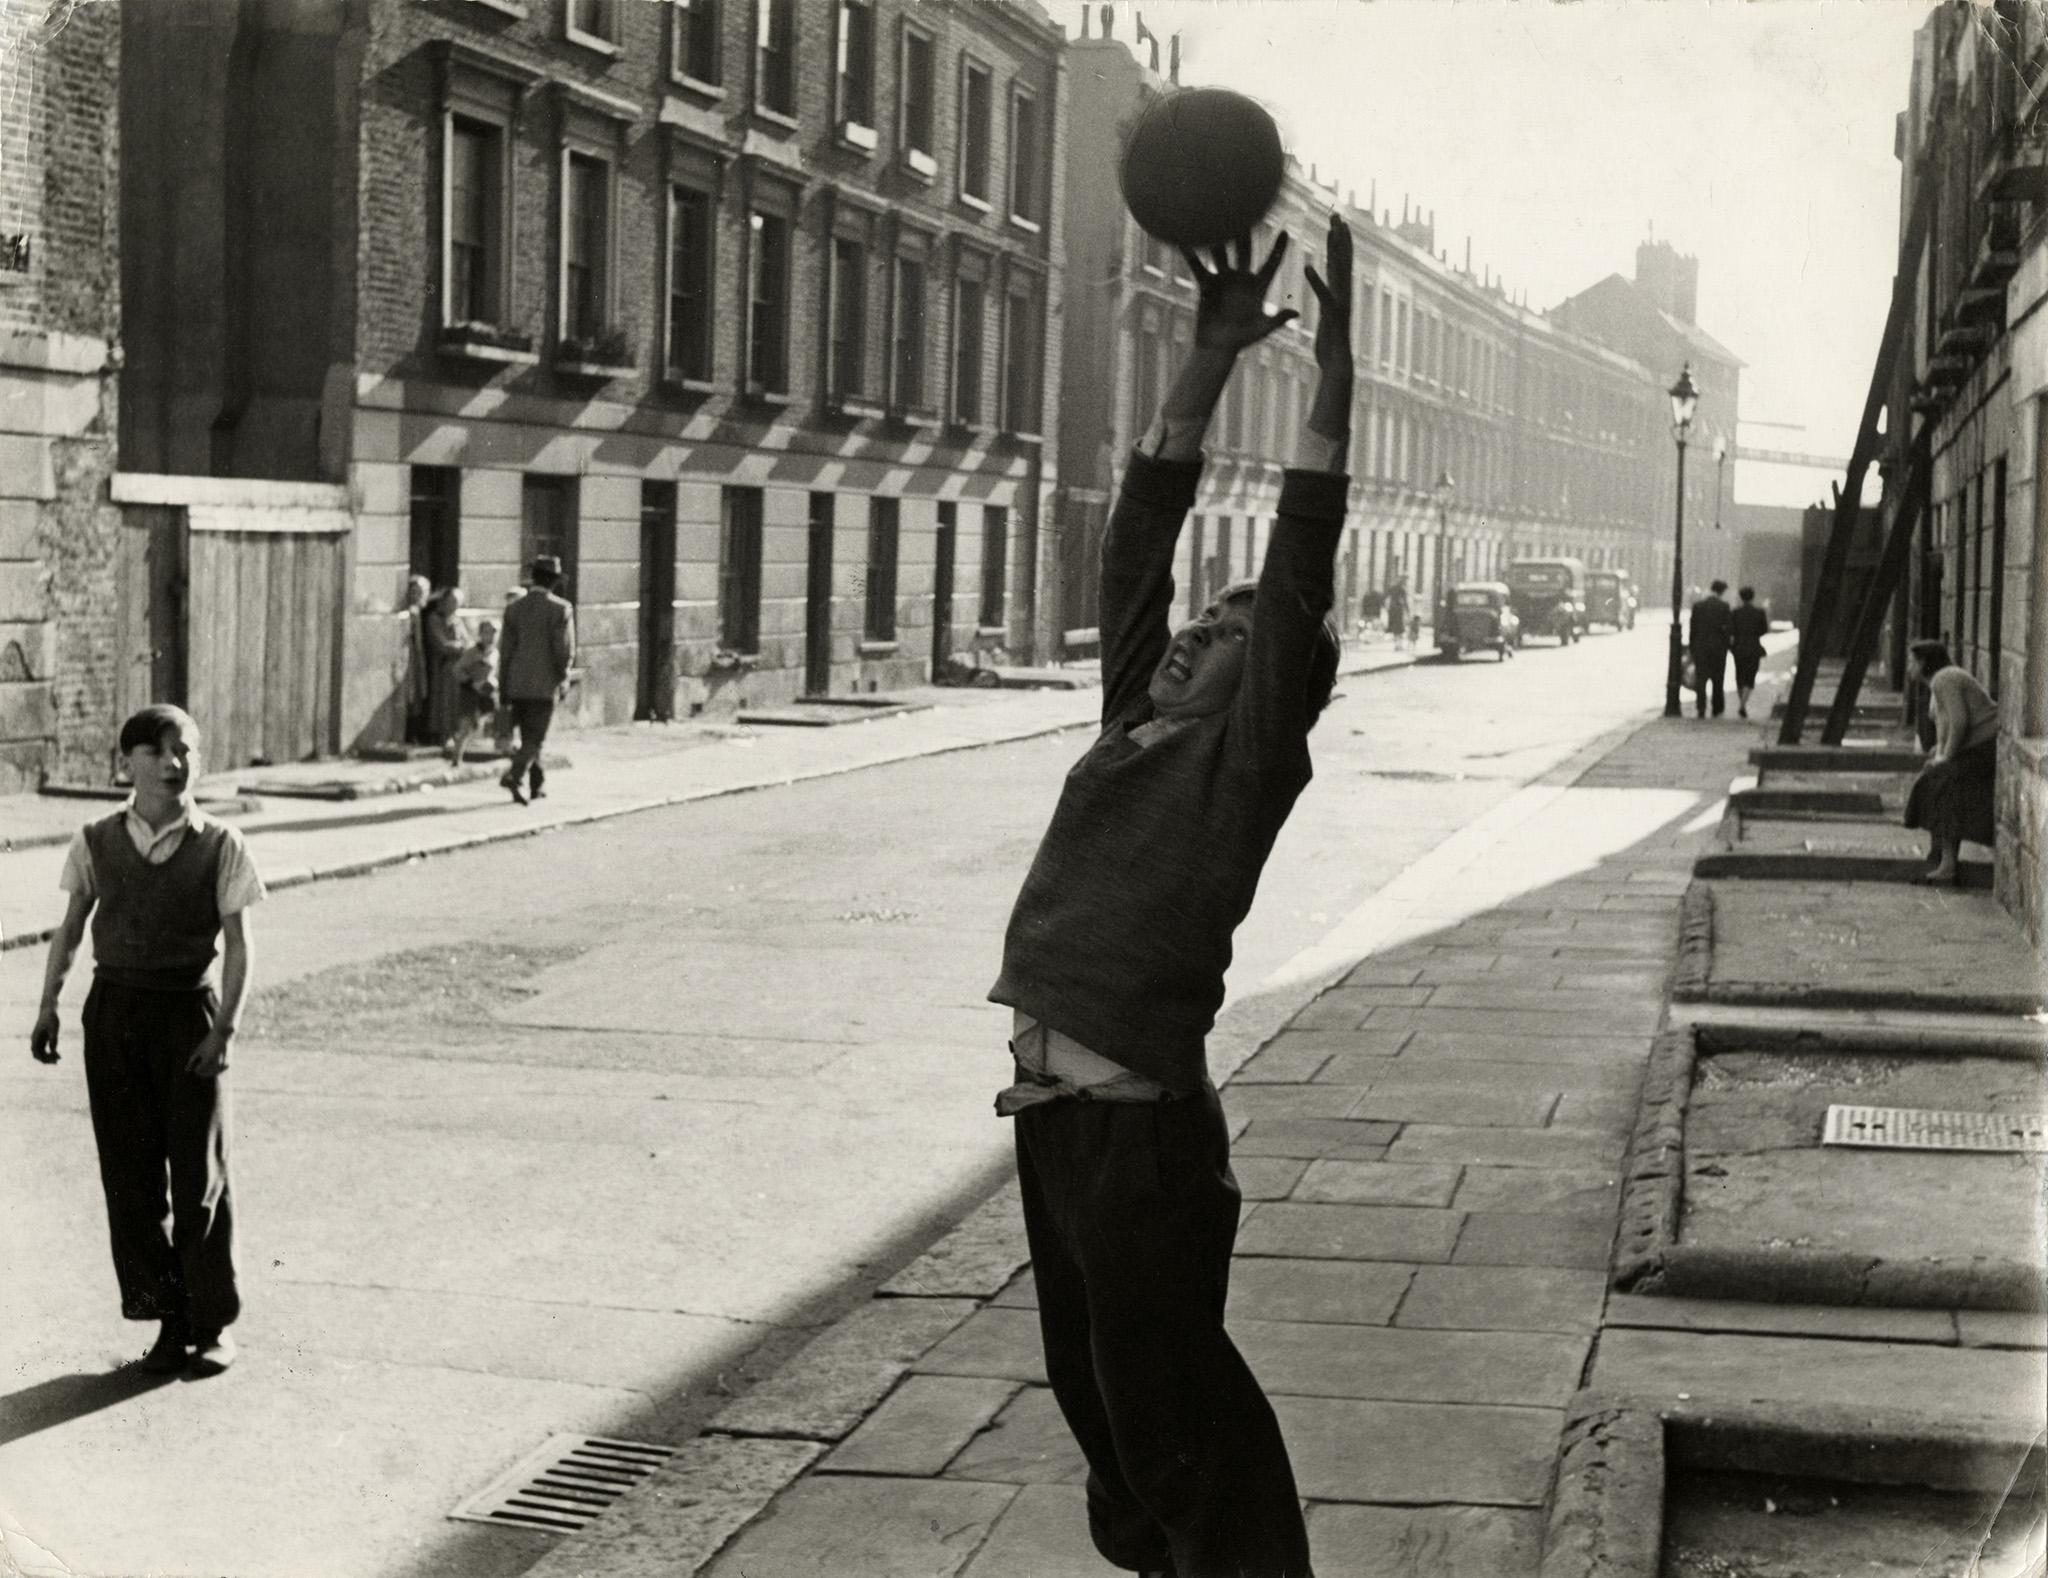 1957. Бриндли-роуд, Паддингтон, Лондон